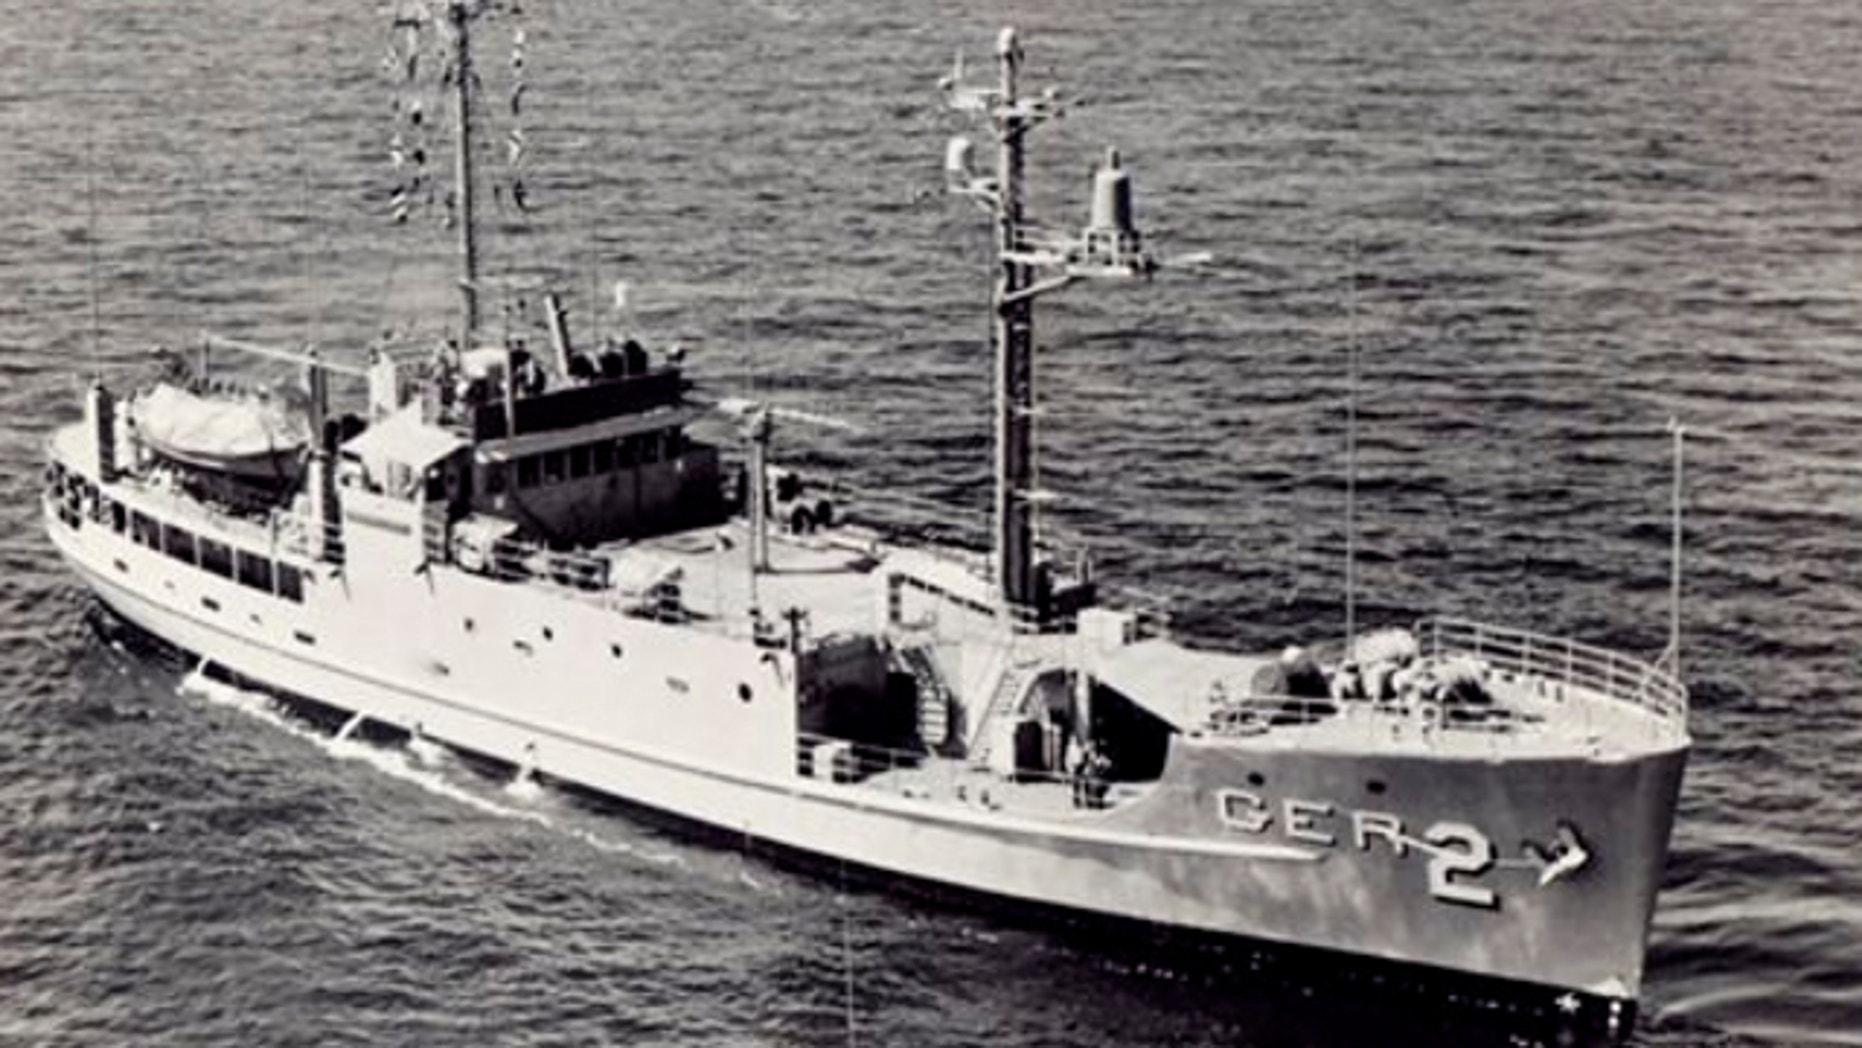 UNDATED: In this file photo from the U.S. Navy, U.S. Navy USS Pueblo sails underway at sea.